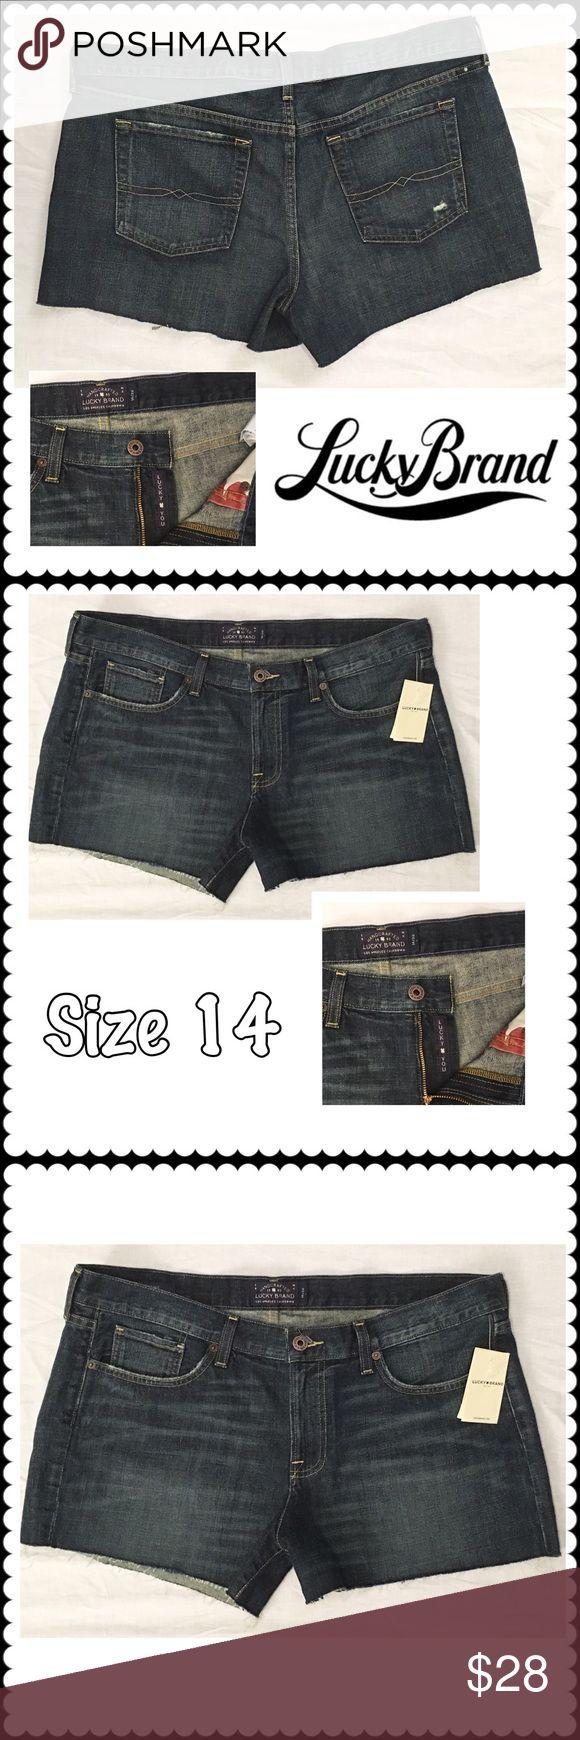 "NEW Cutoff Jean shorts by LUCKY BRAND Sz 14 Dark denim cutoff shorts by LUCKY BRAND. Sz 14 (19"" across waist, 3"" inseam) Cute! Lucky Brand Shorts Jean Shorts"